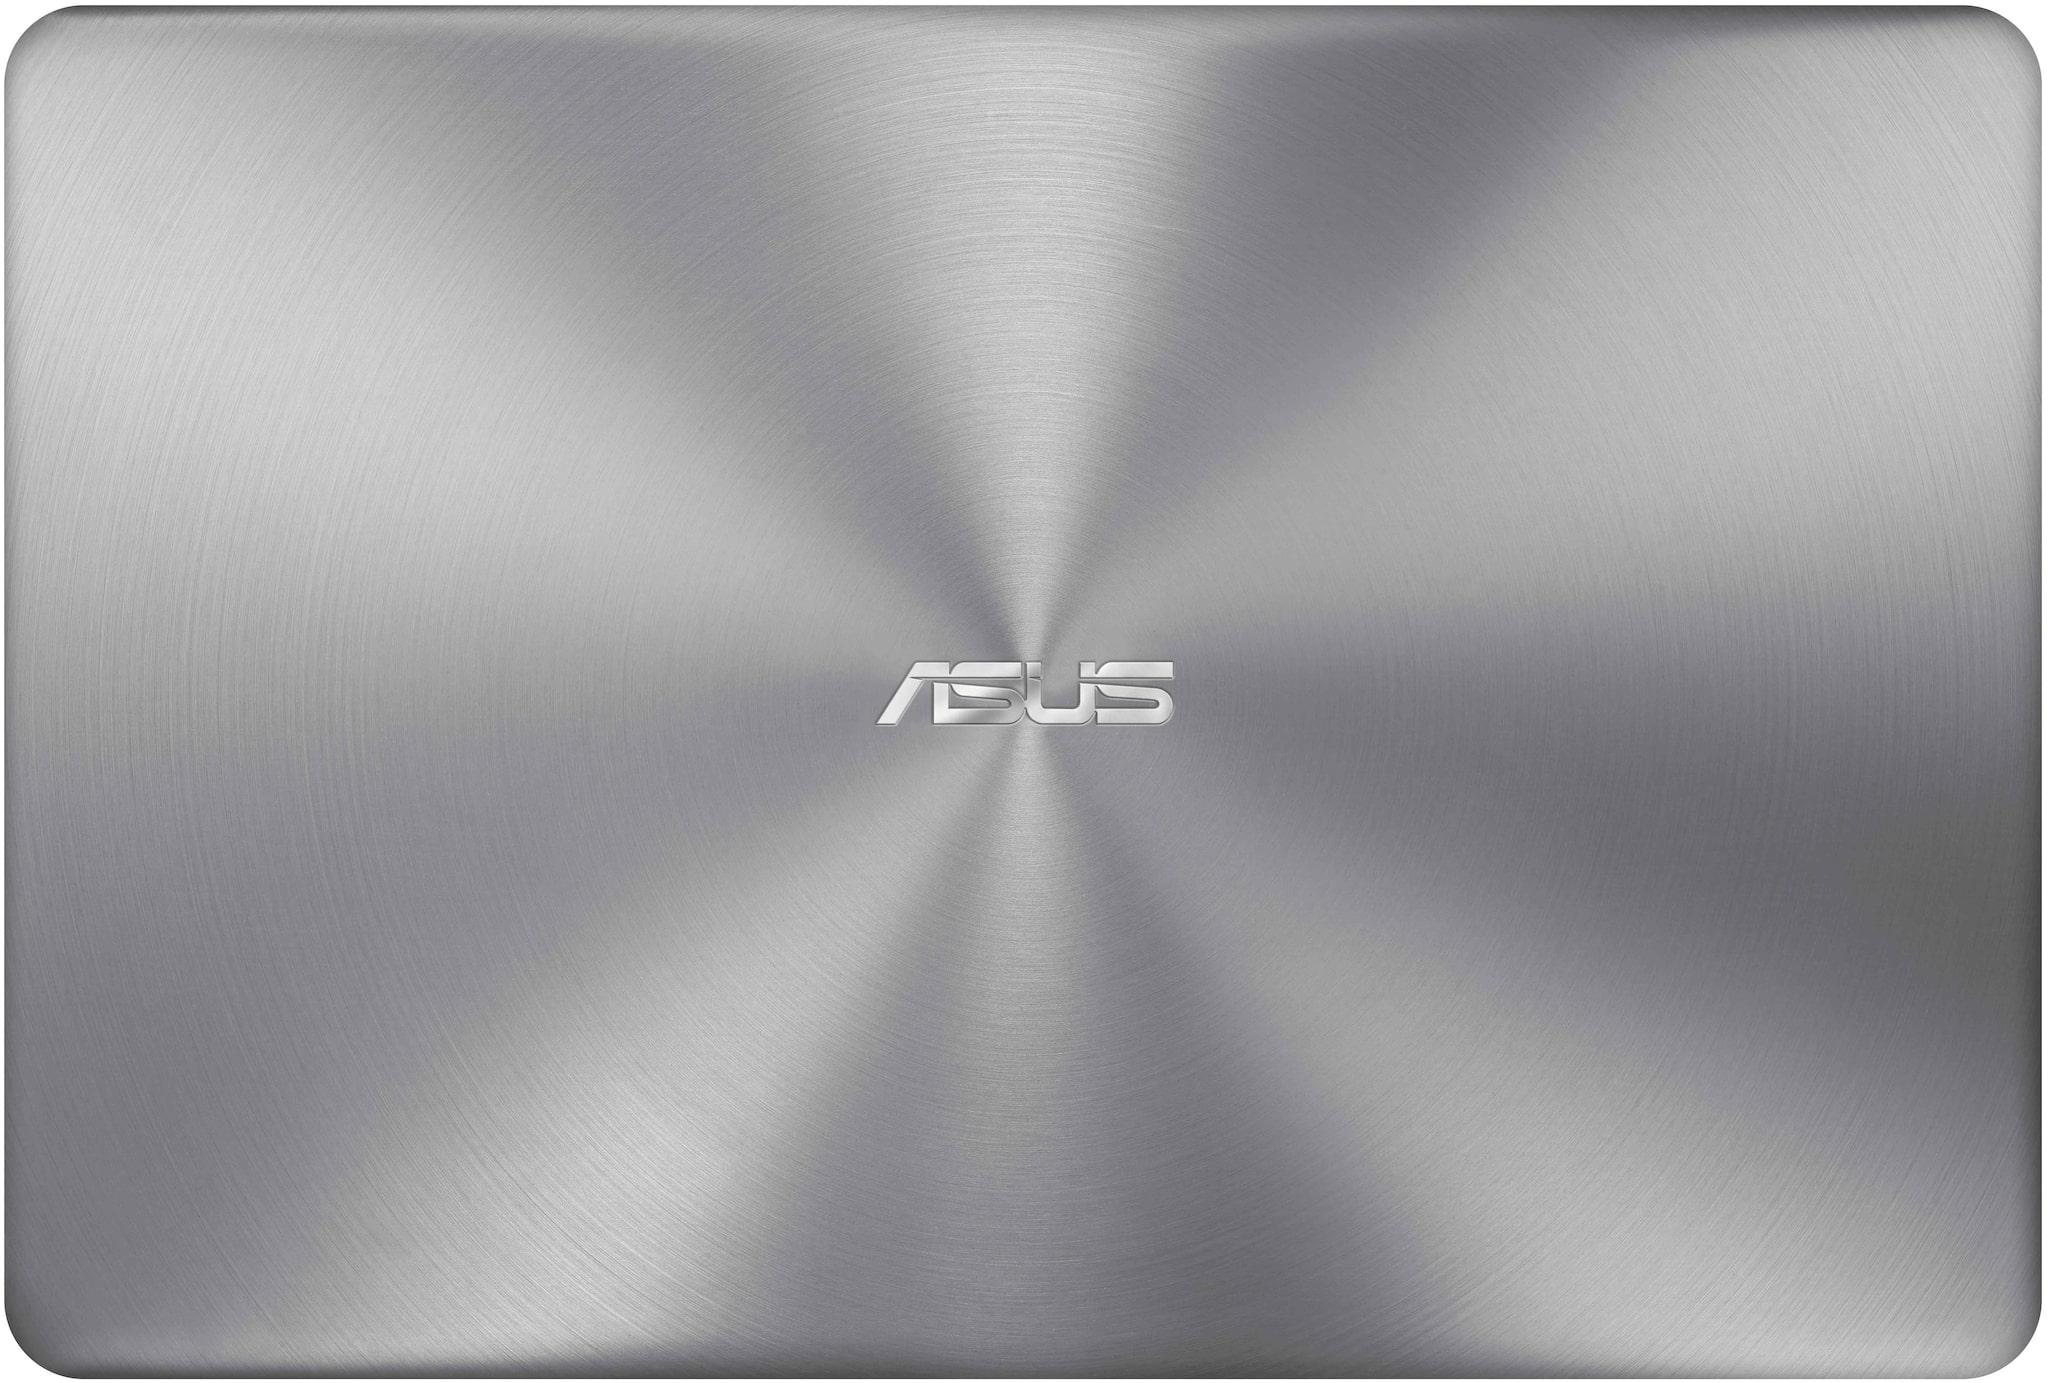 ASUS Vivobook 15 X510 (Core i5-8th/4 GB+16 GB Optane Memory/1 TB/39.62 cm (15.6 Inch) FHD/Windows 10/2 GB Graphics) Thin and Light Laptop X510UF-EJ592T (Grey, 1.7 Kg)